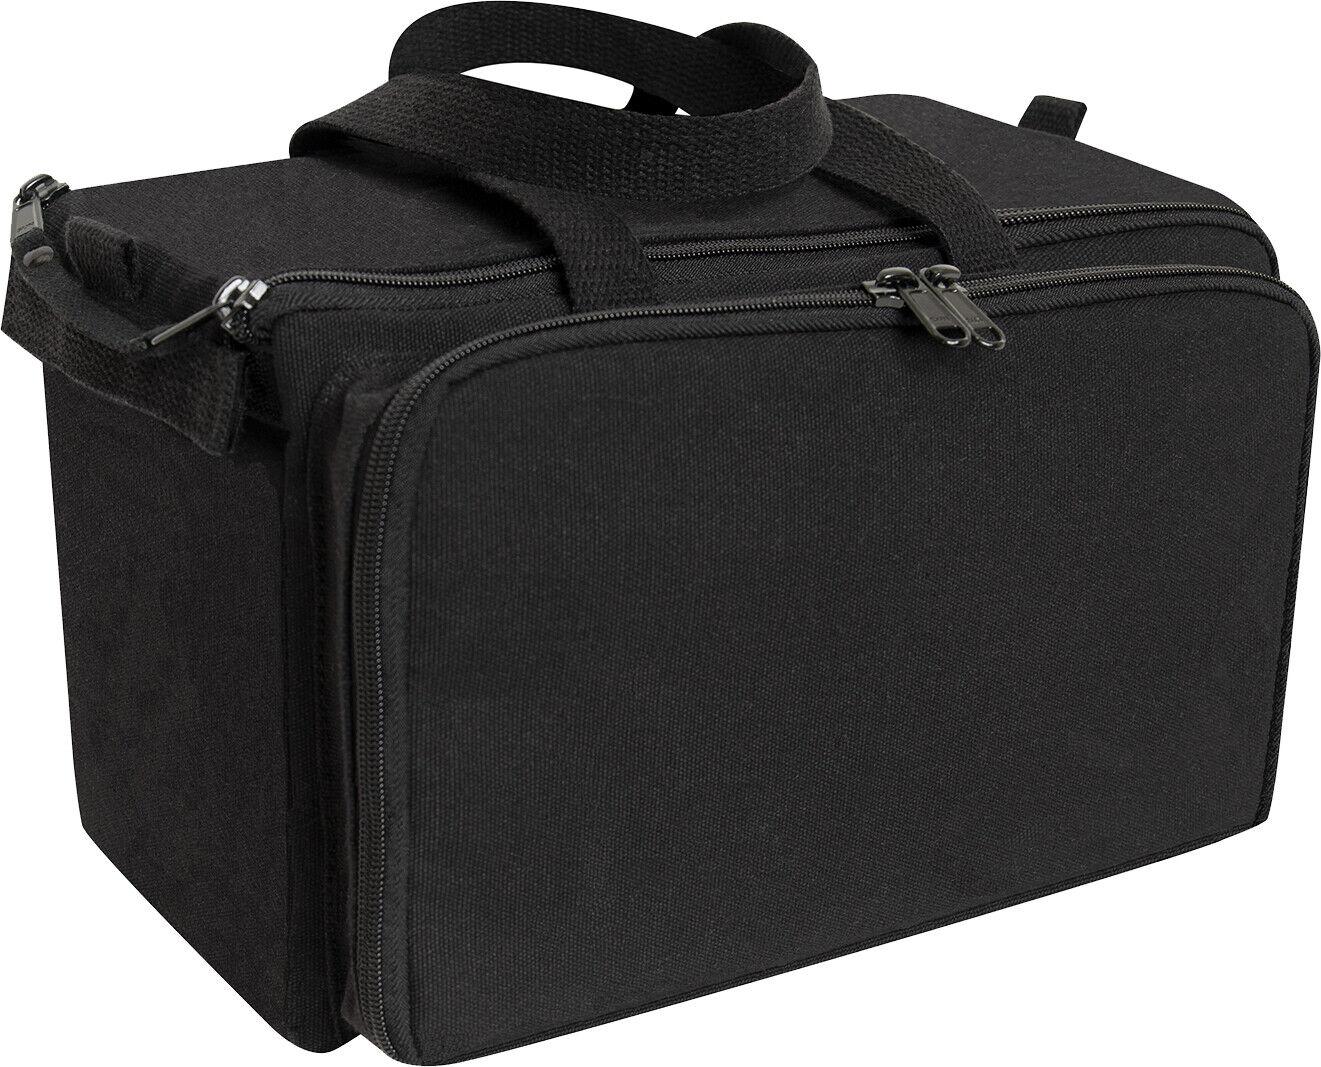 Black Canvas Tactical Shooting Range Bag Firearm Carry Gear Bags